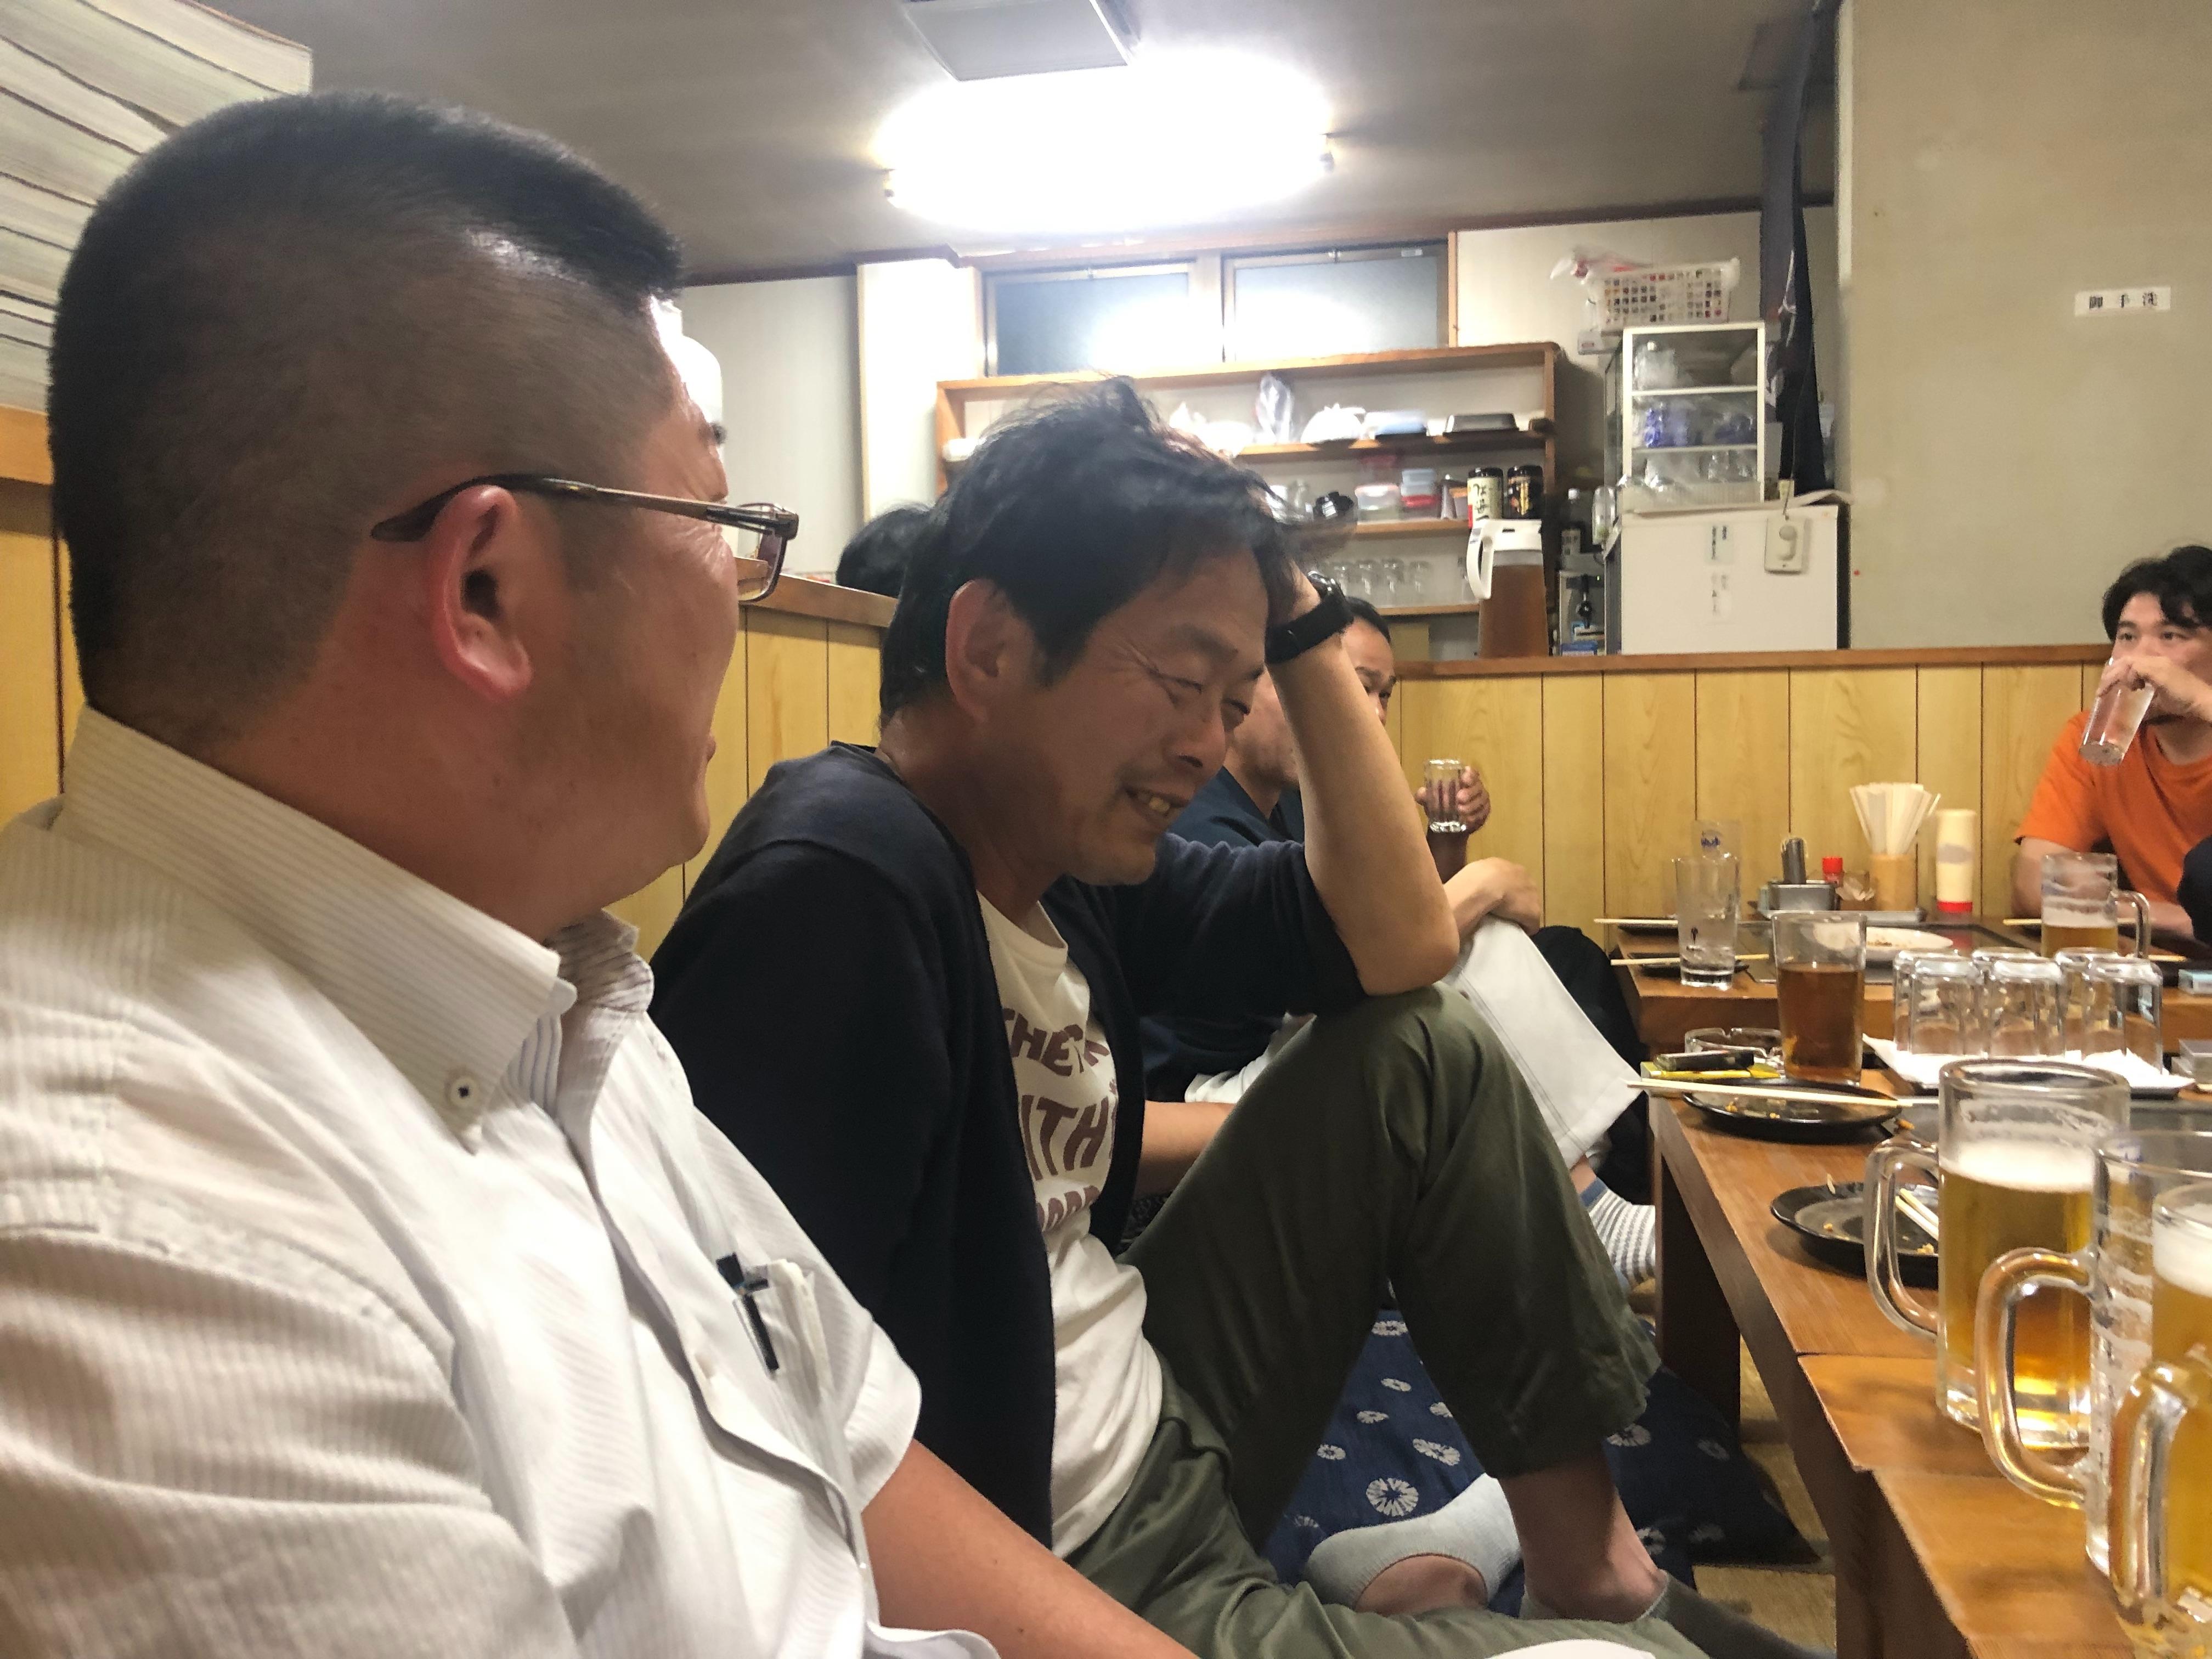 f:id:masanori-kato1972:20190517200330j:image